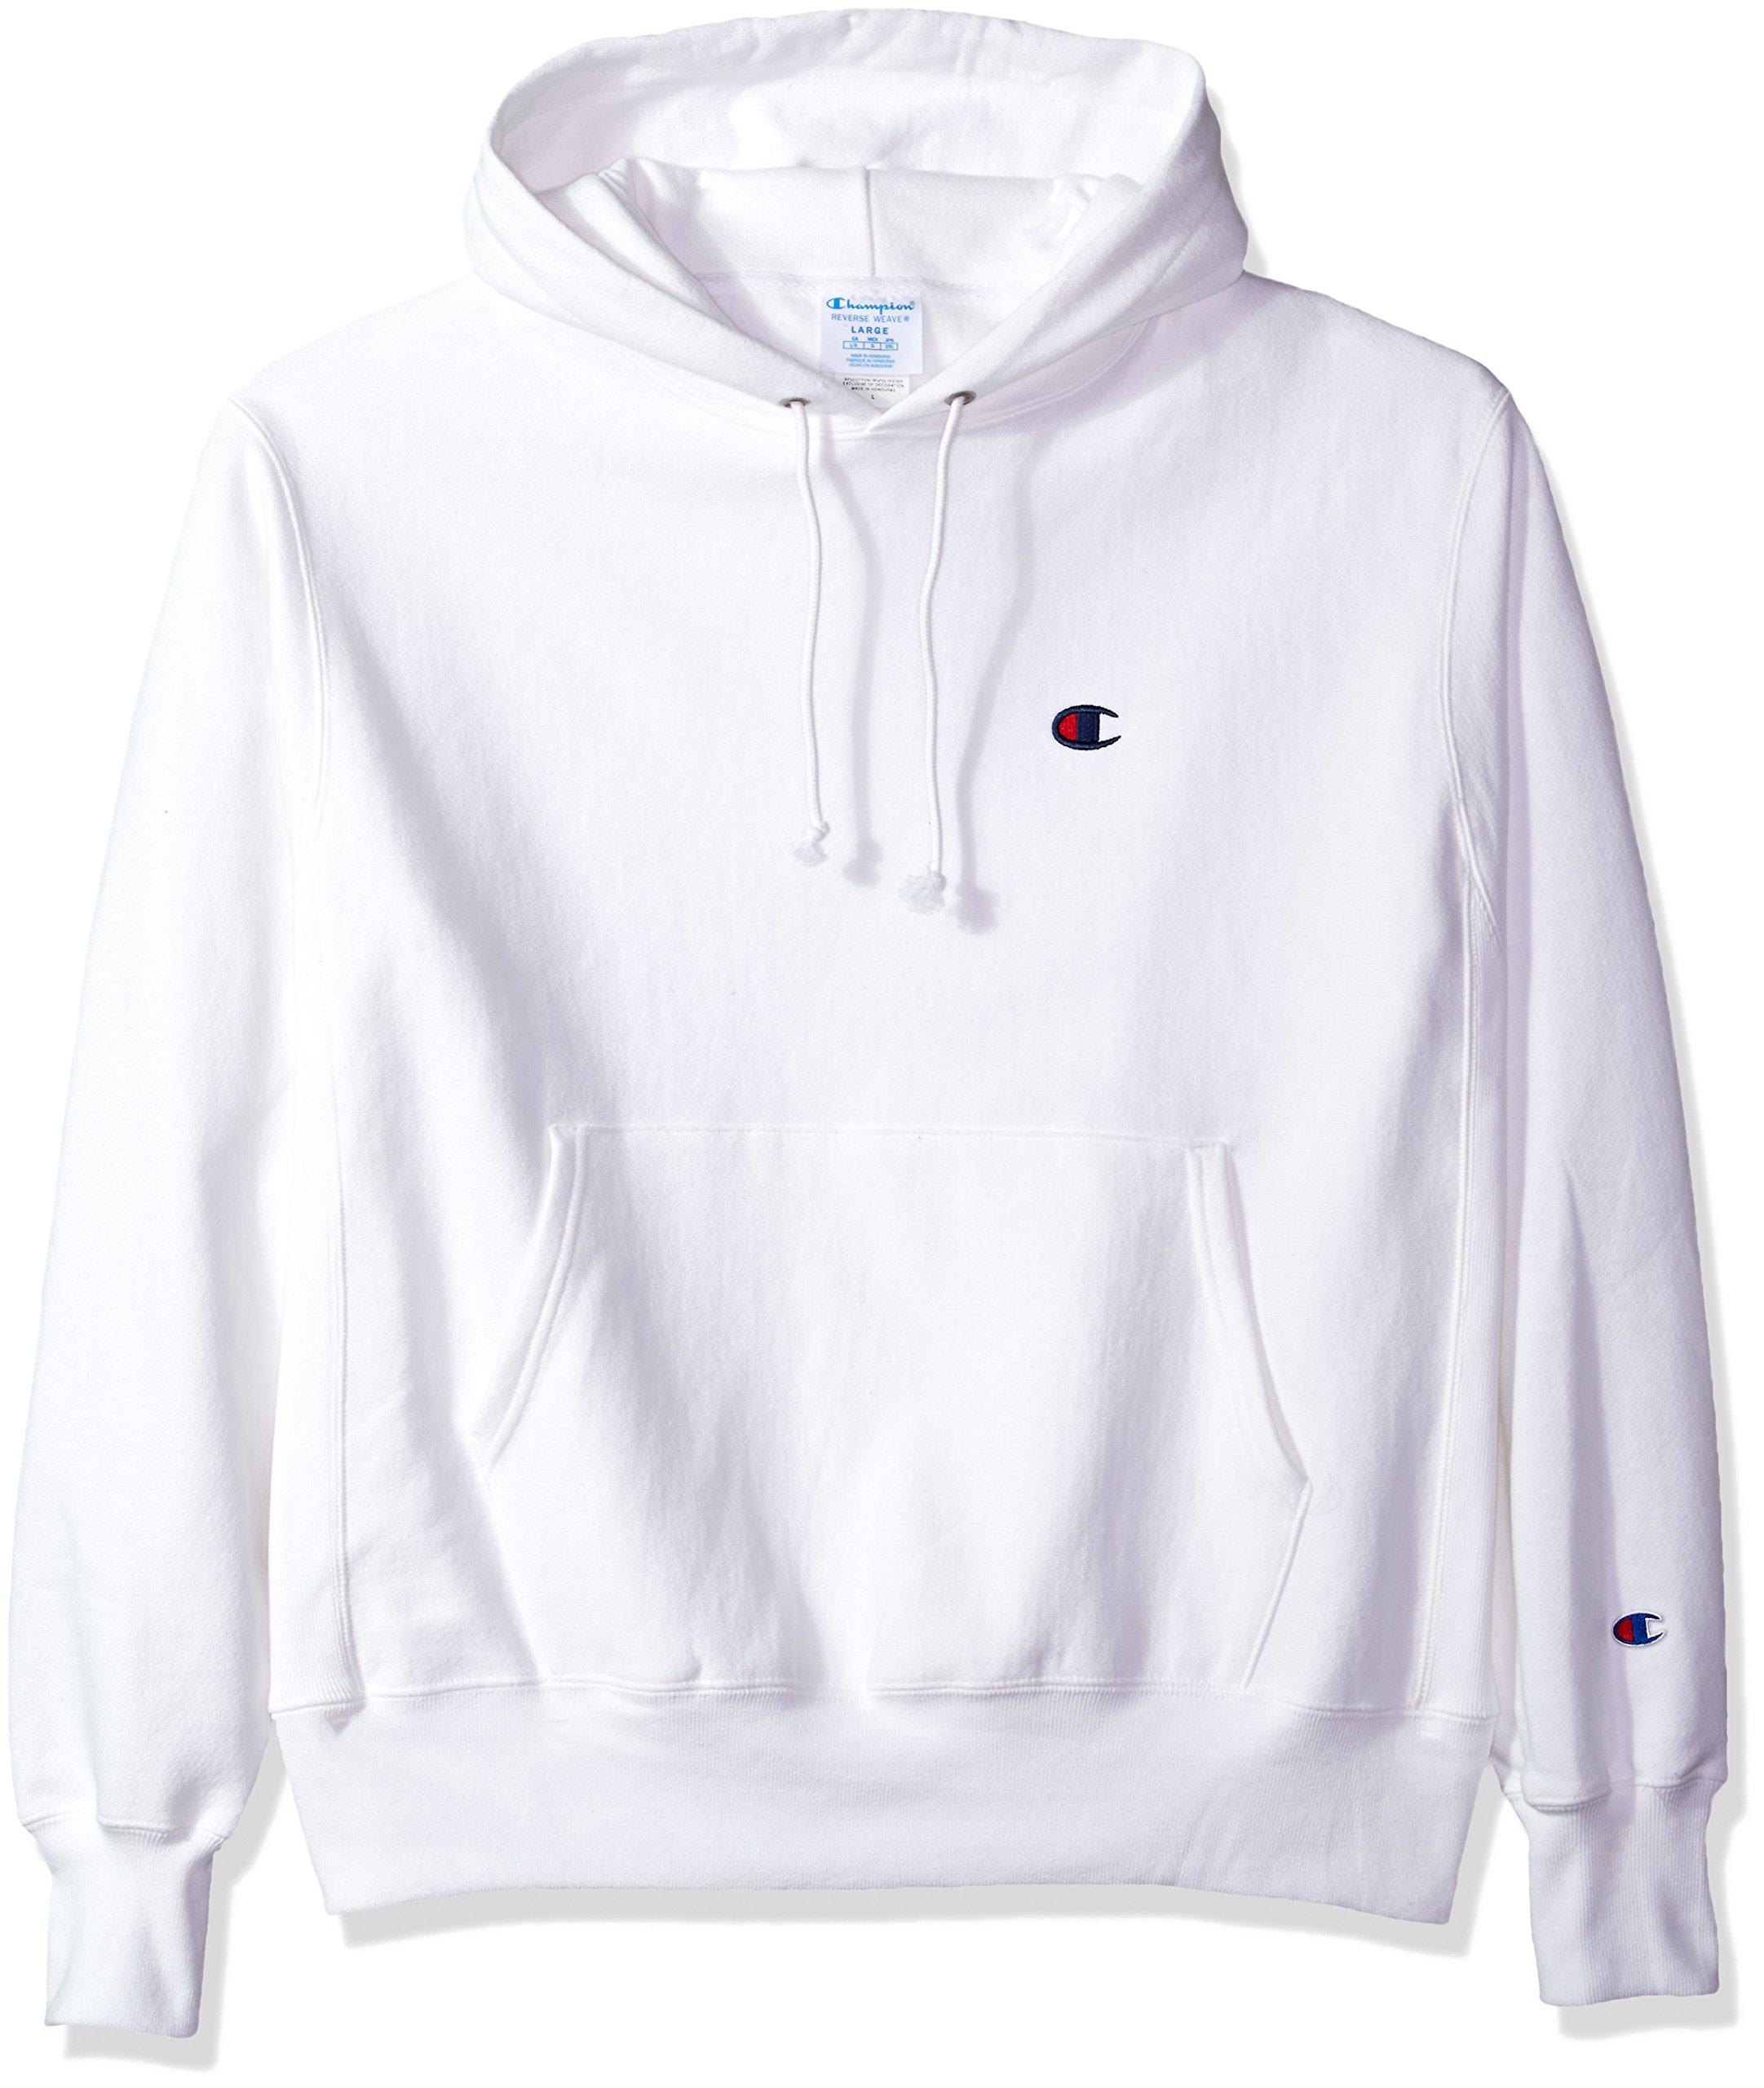 09e0a808 Galleon - Champion LIFE Men's Reverse Weave Pullover Hoodie, White/Left  Chest C Logo, Medium